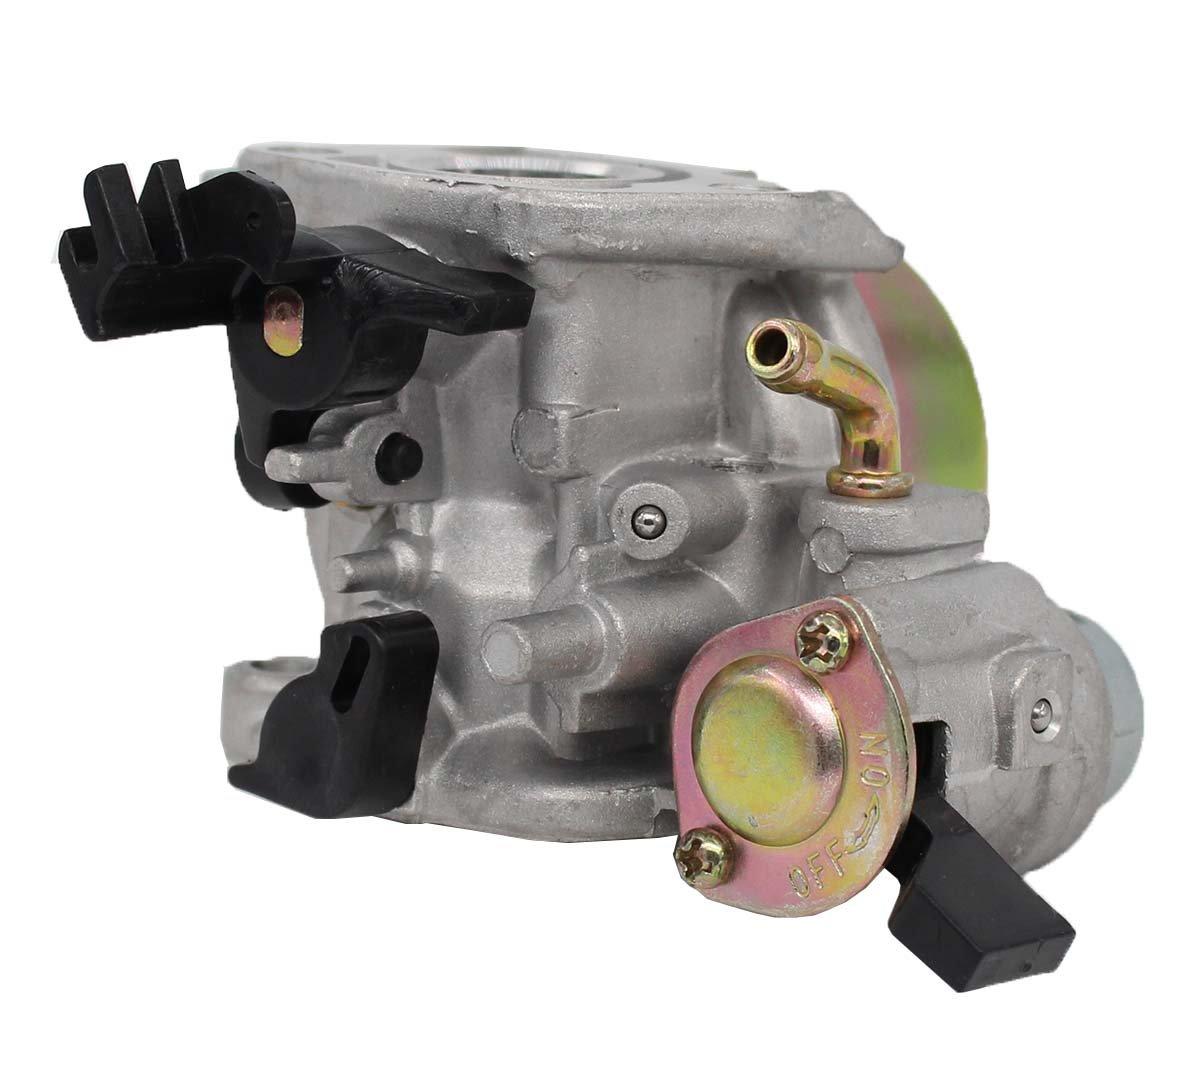 MOTOKU Carburetor Air Filter Spark Plug Fuel Filter For Harbor Freight Predator 212cc Homelite Pressure Washer 179CC 180cc DJ165F 2700PSI 2.3GPM UT80522D Honda GX160 5.5HP GX200 6.5 HP Engine